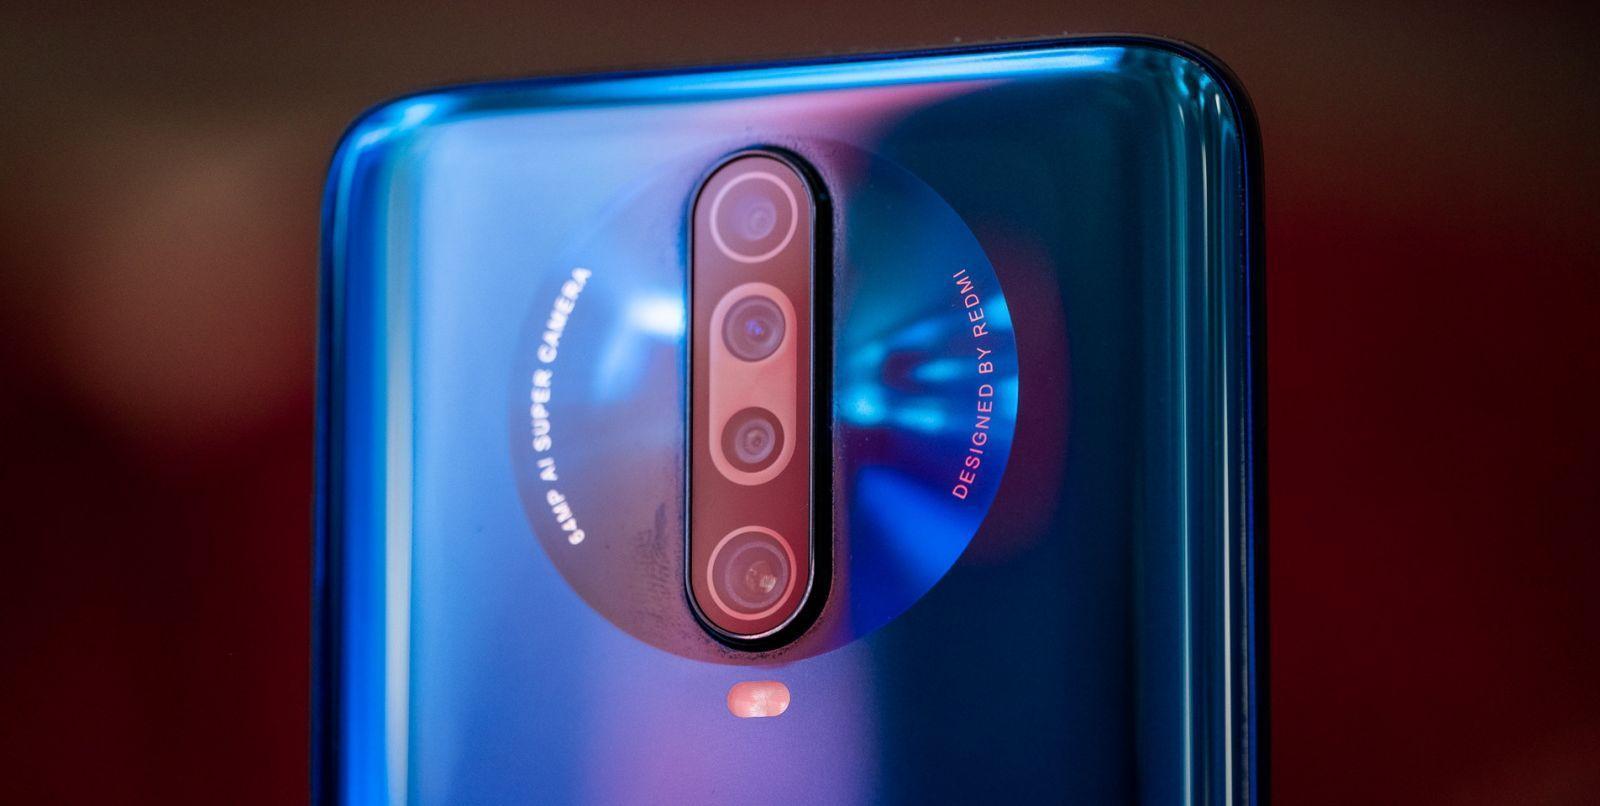 В базе TENAA засветилась новая версия смартфона Redmi K30 (redmi k30 2 of 8)